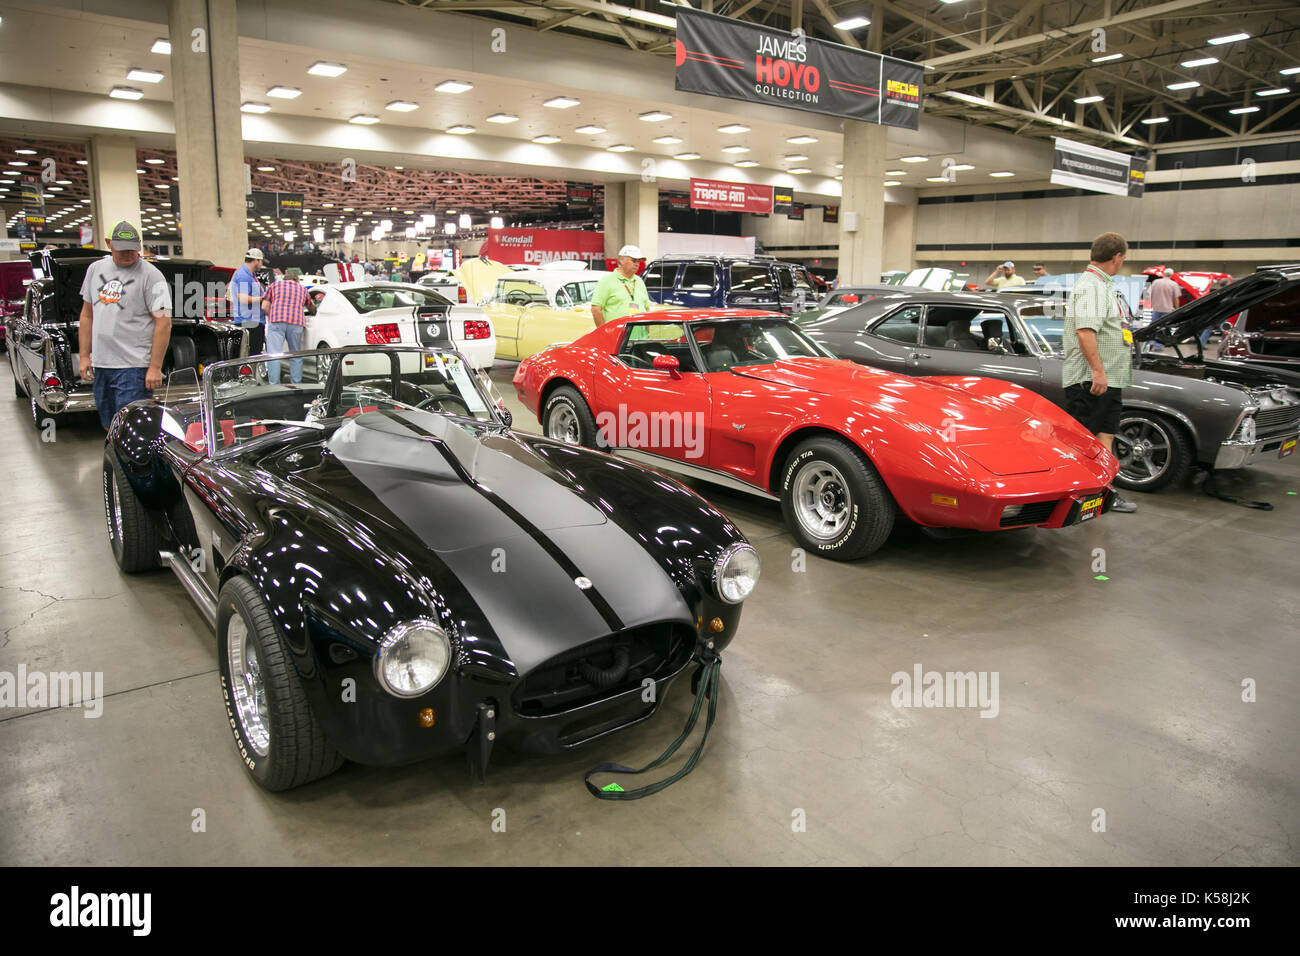 Charming Car Auctions Usa Contemporary - Classic Cars Ideas - boiq.info